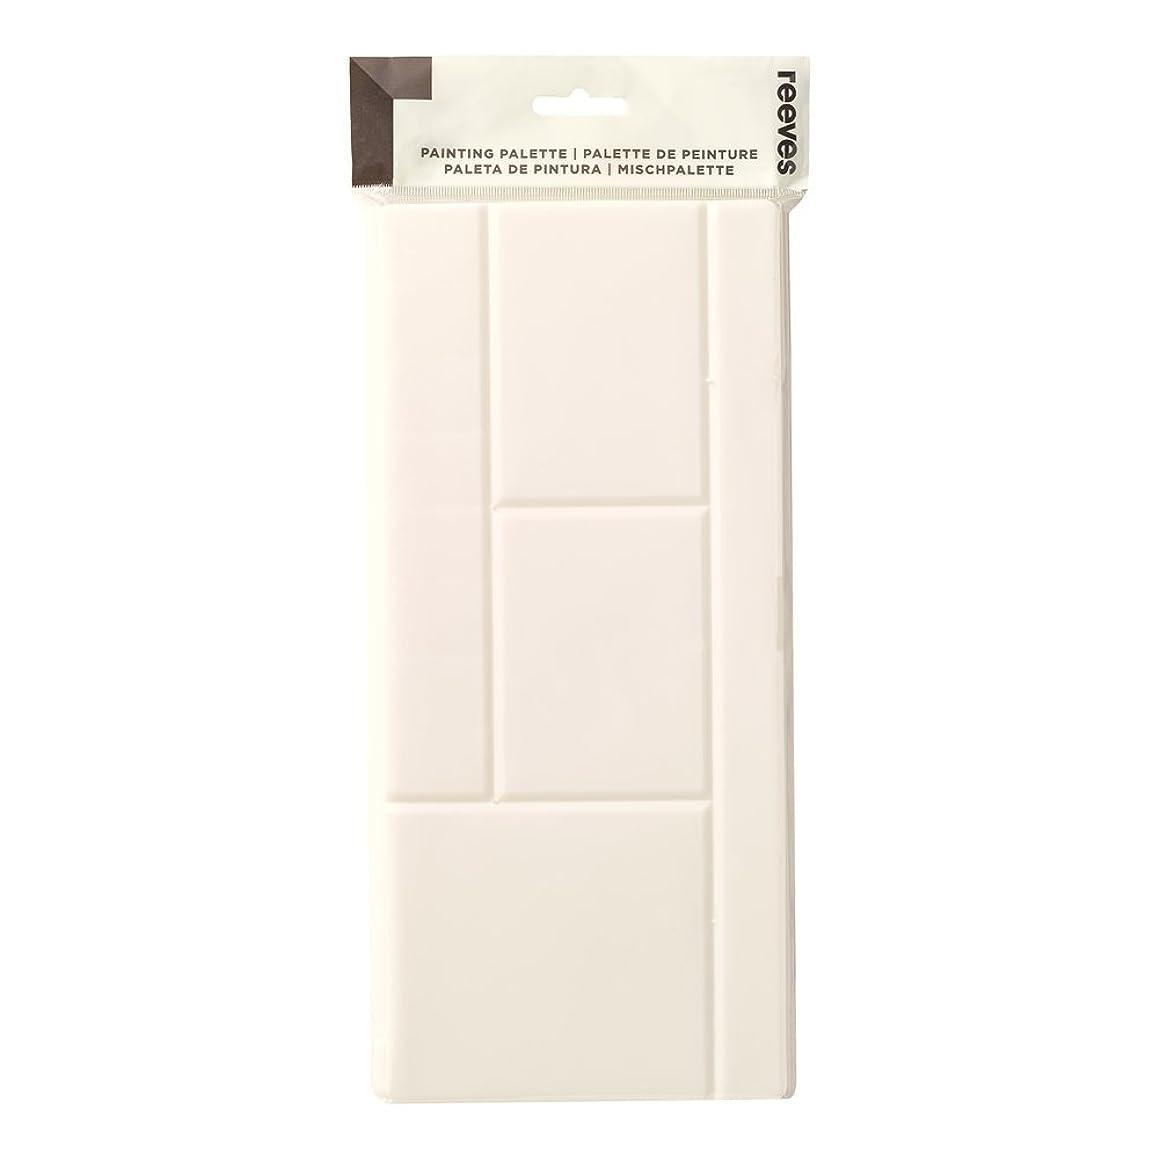 Winsor & Newton Reeves Large Folding Plastic Paint Palette